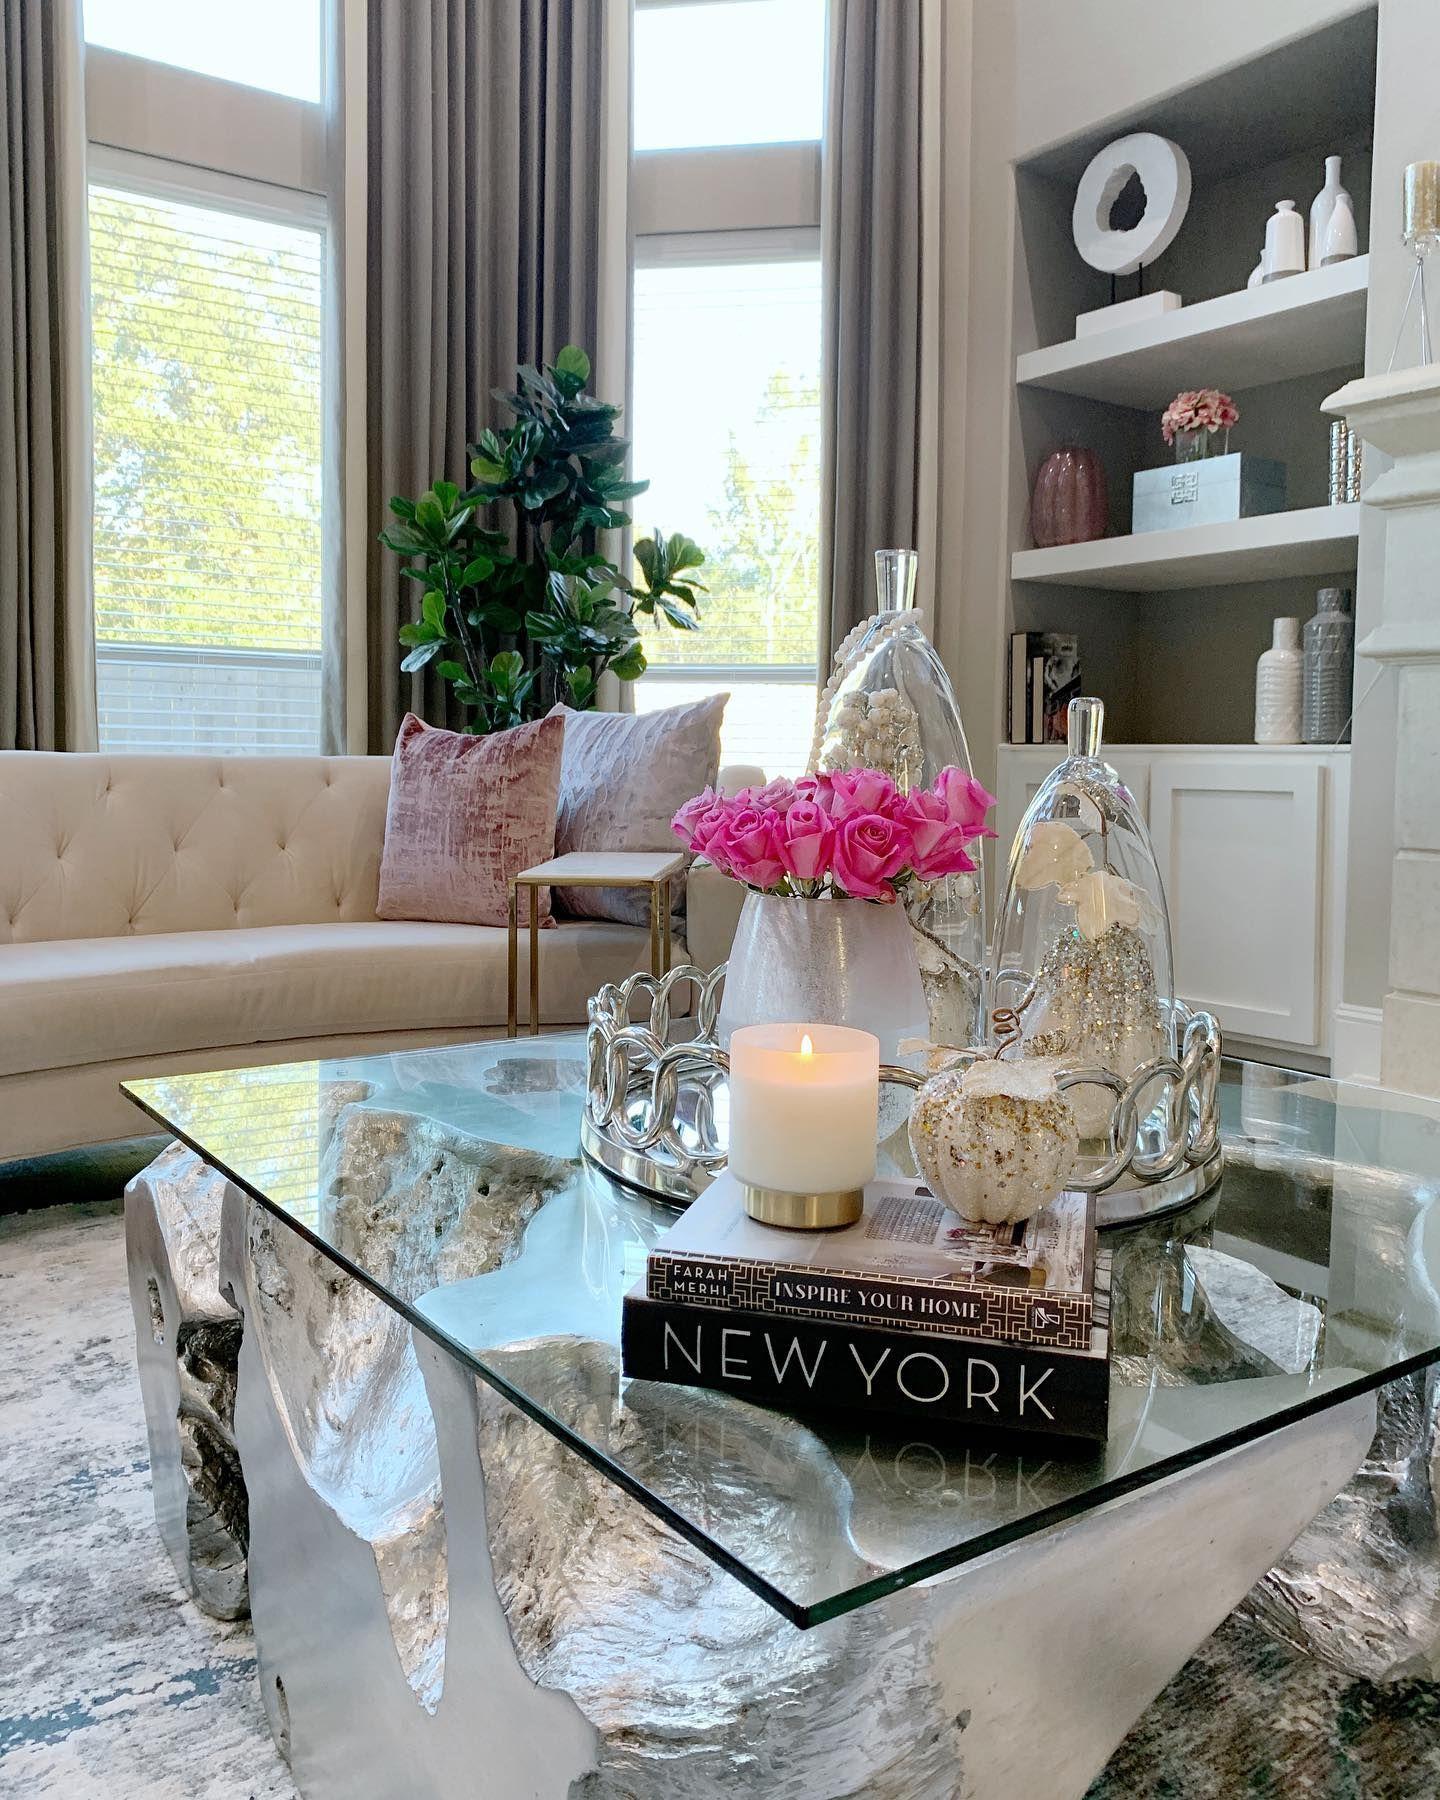 So I Received My Inspire Your Home Book By Farah Merhi Farahjmerhi Inspire Me Home Decor Yesterday Home Decor Interior Design Career Decorating A New Home